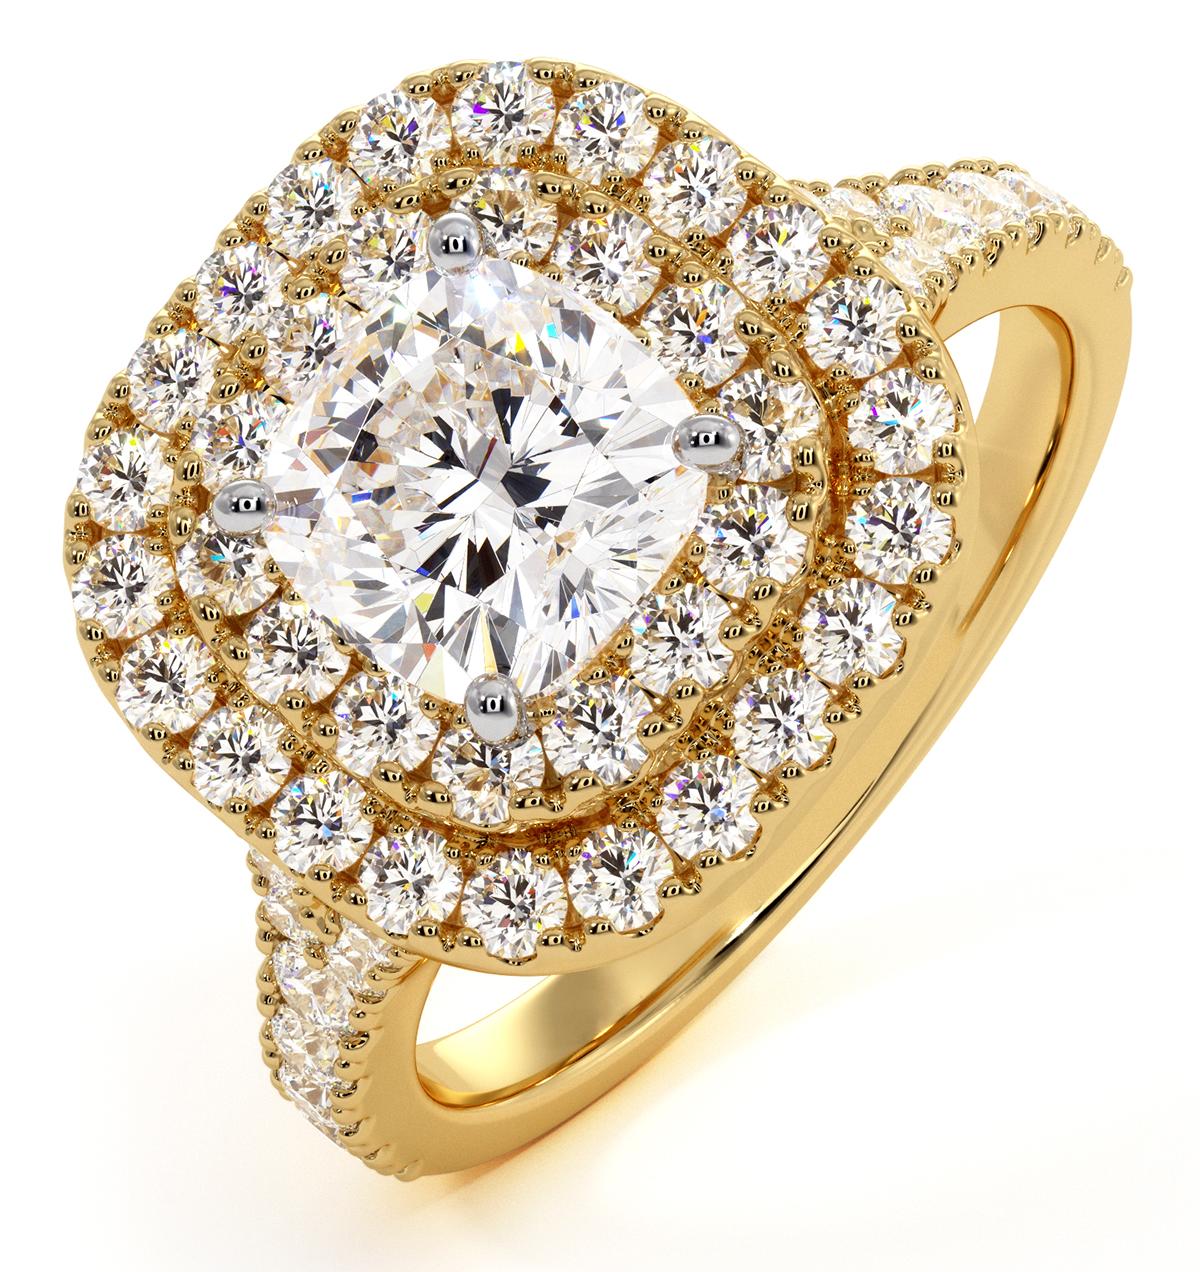 Anastasia GIA Diamond Halo Engagement Ring in 18K Gold 1.70ct G/SI2 - image 1